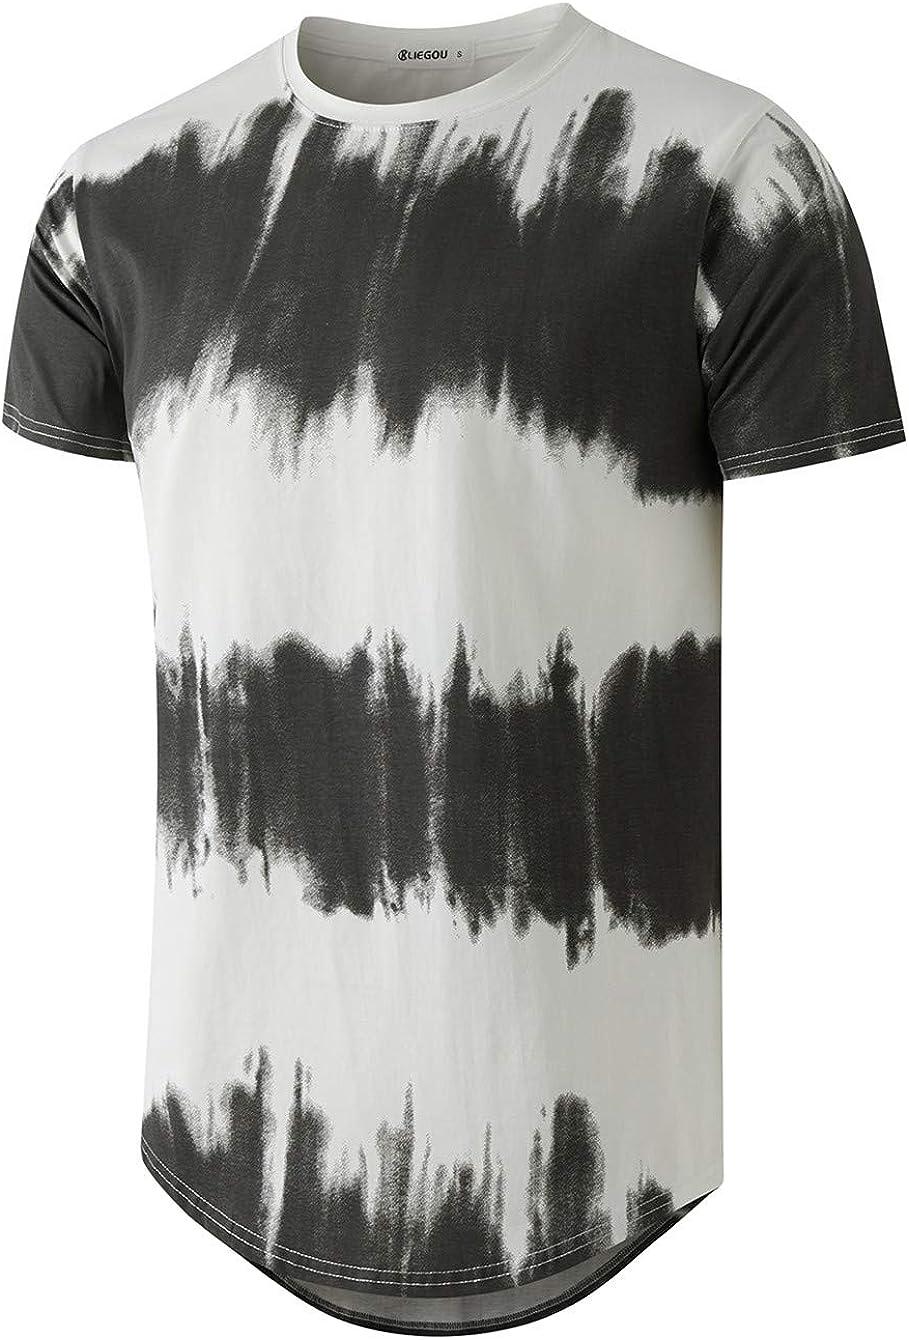 New Superlatite life KLIEGOU Men's Fashion Hip Hop Block Color T-Shirt Stripe